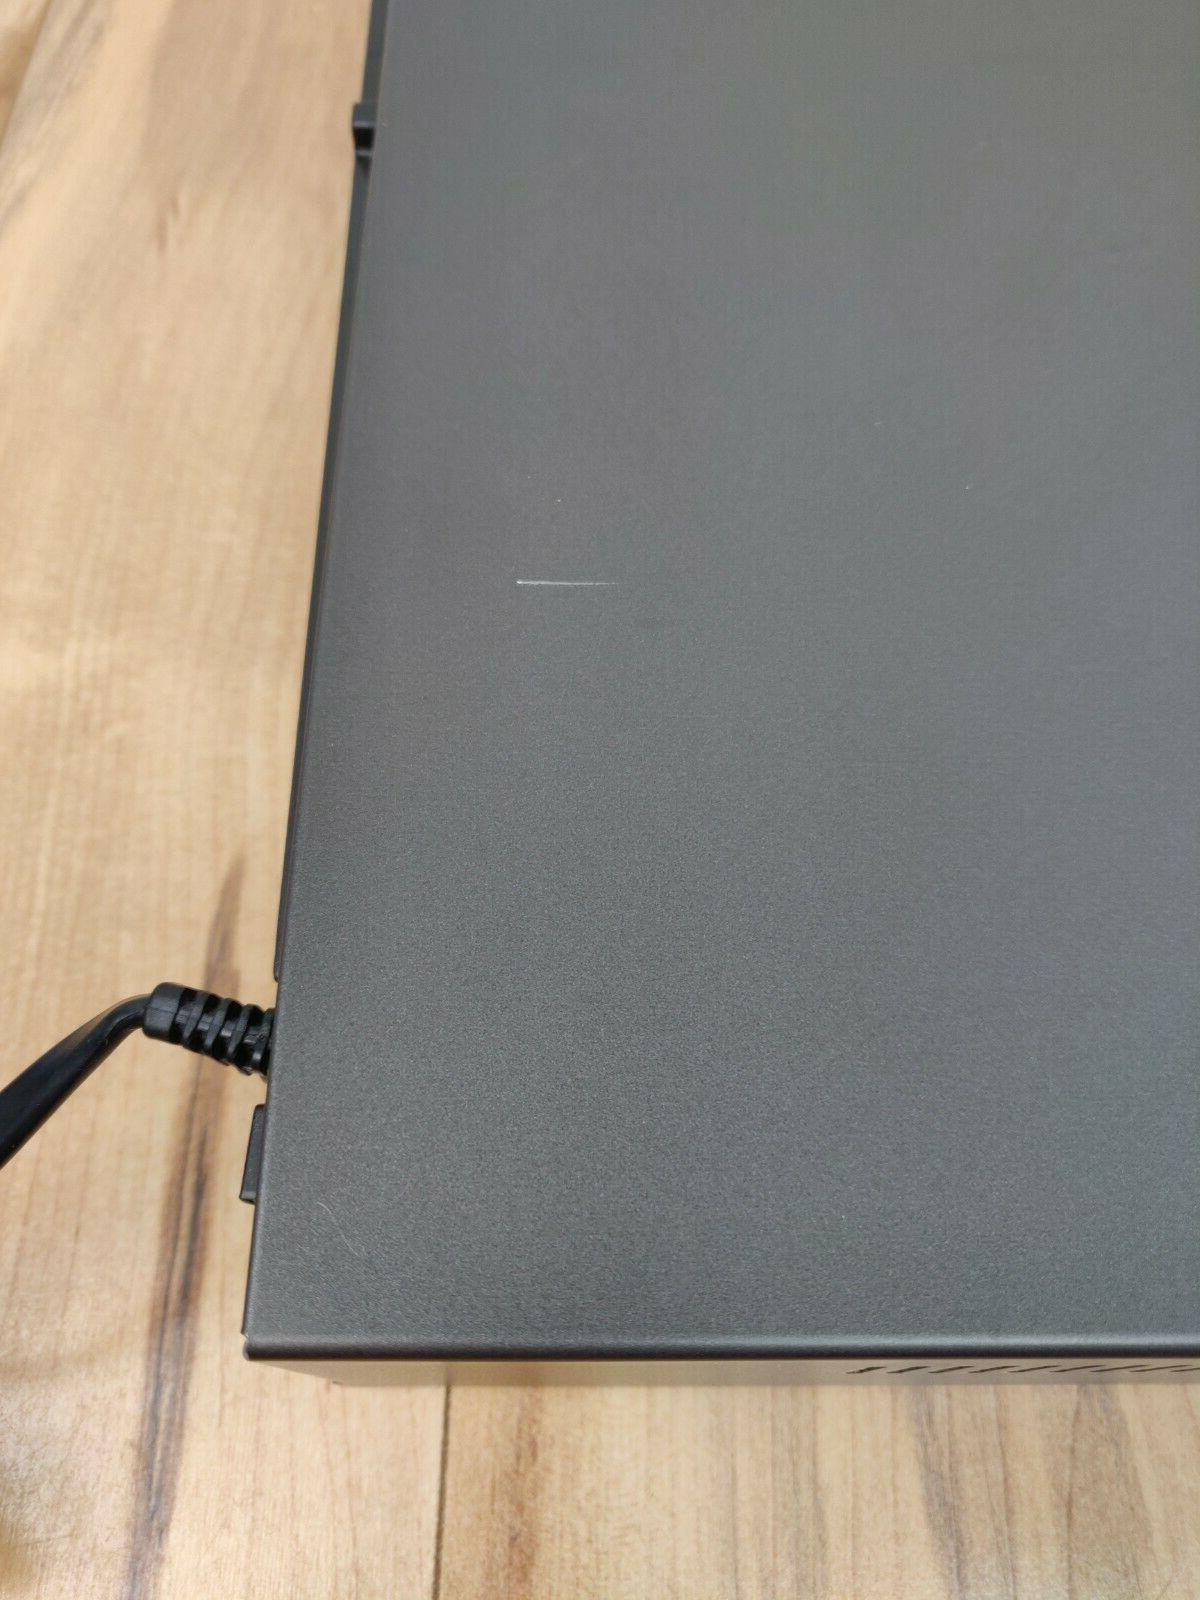 Toshiba 4 Hi-Fi Player Video Tested